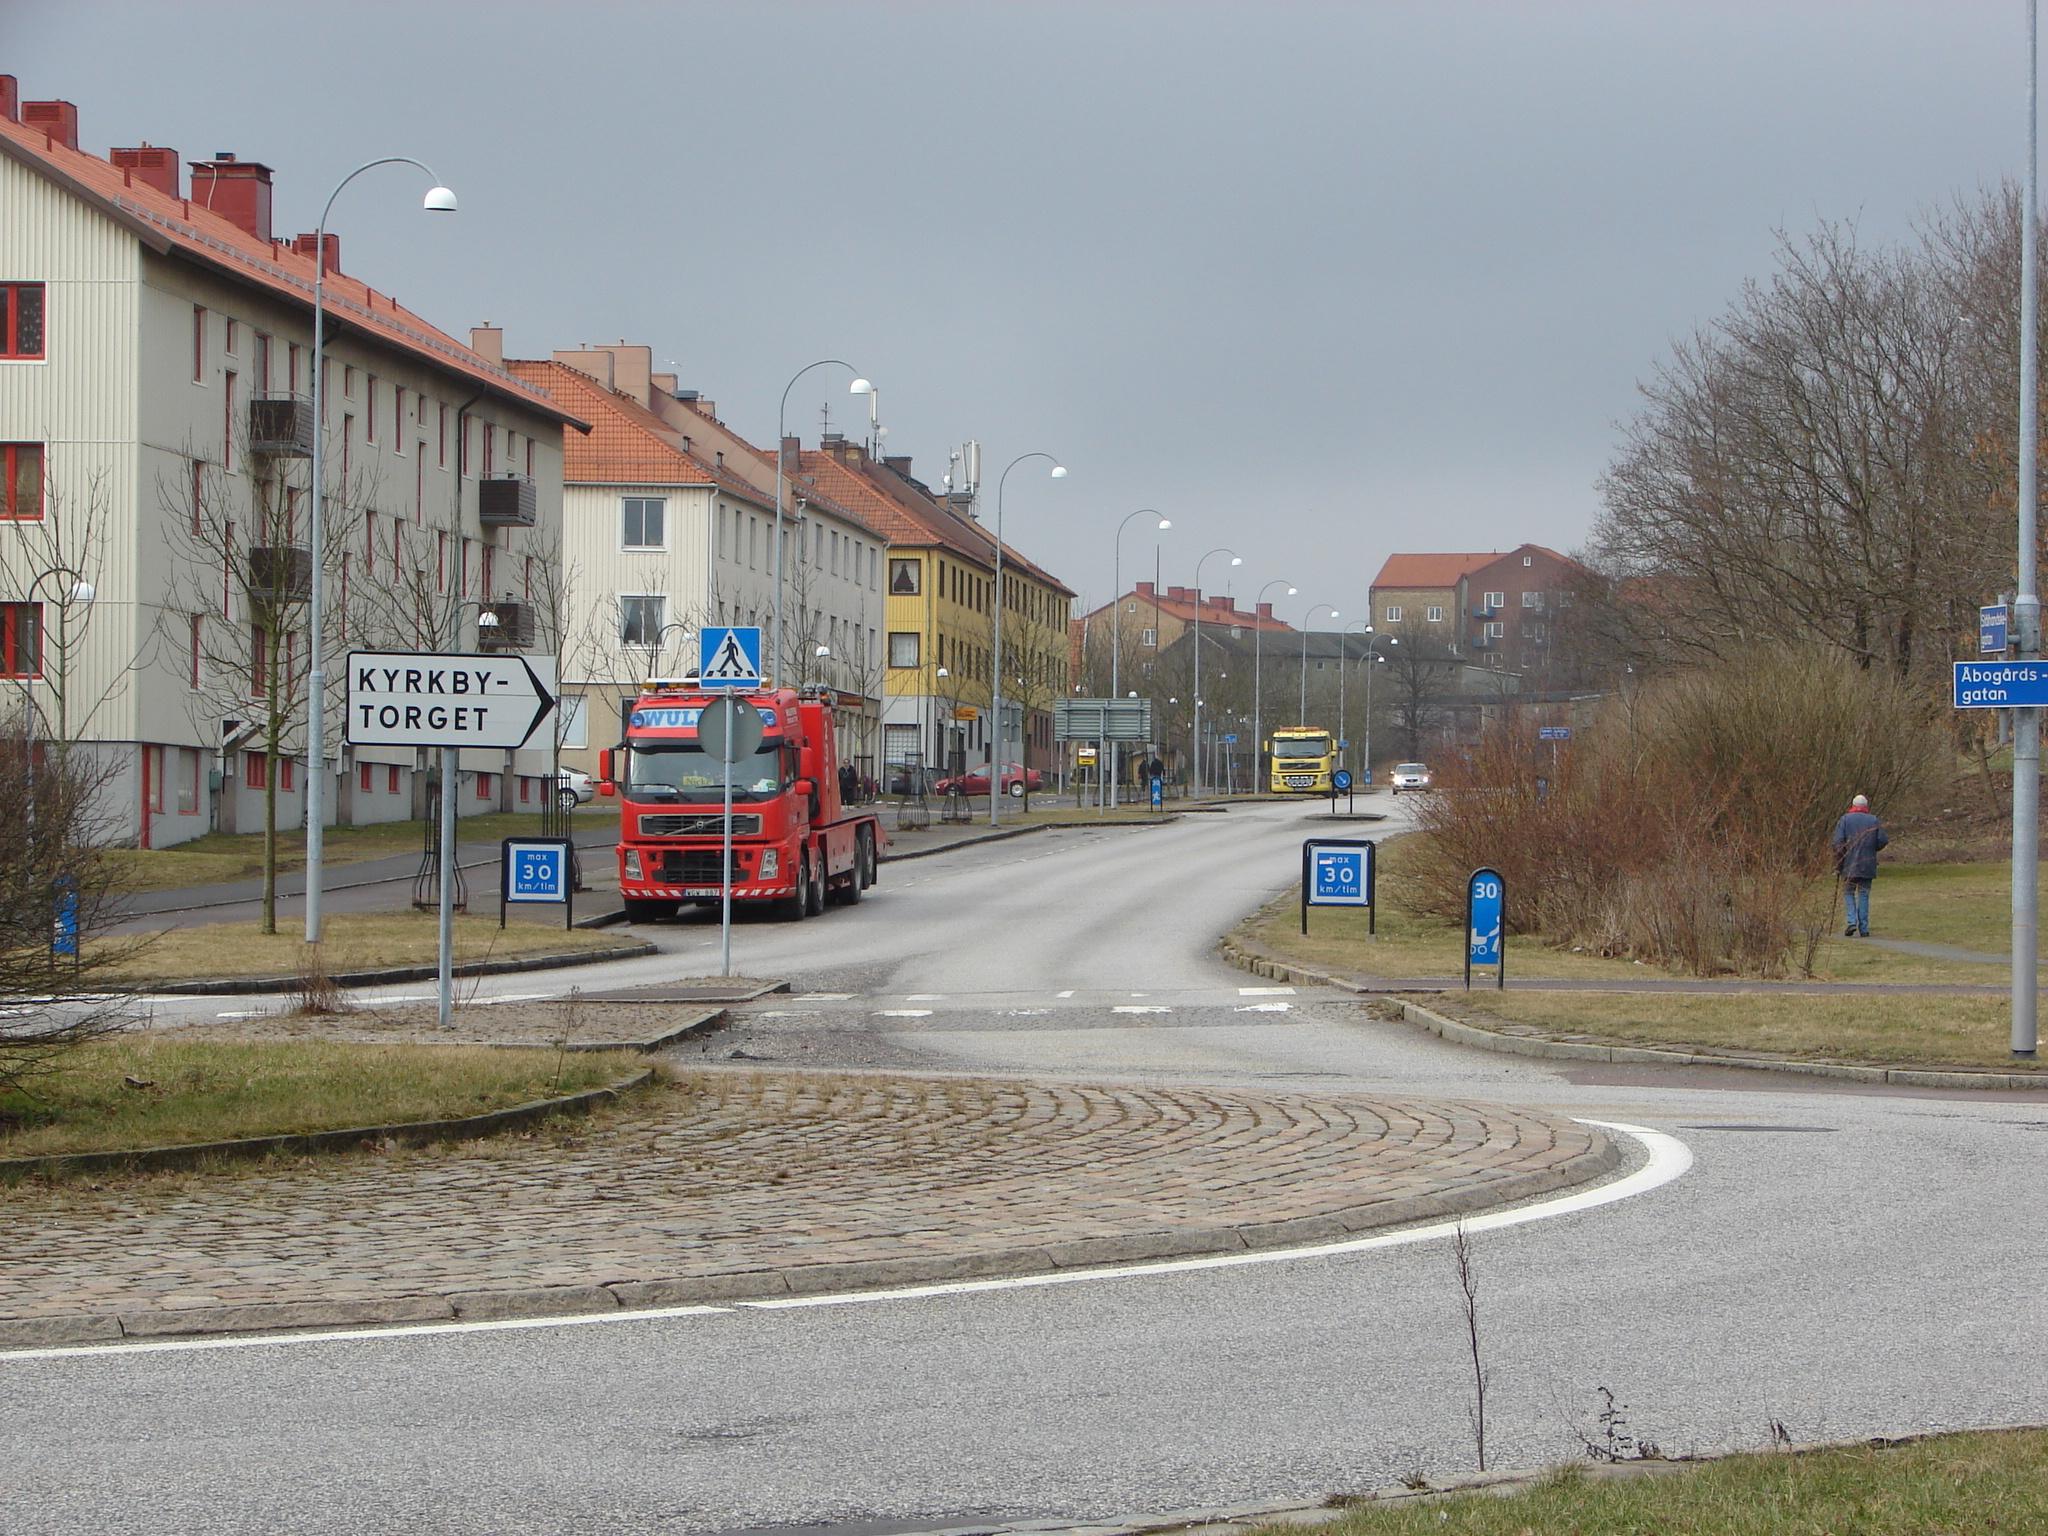 kyrkbyn göteborg